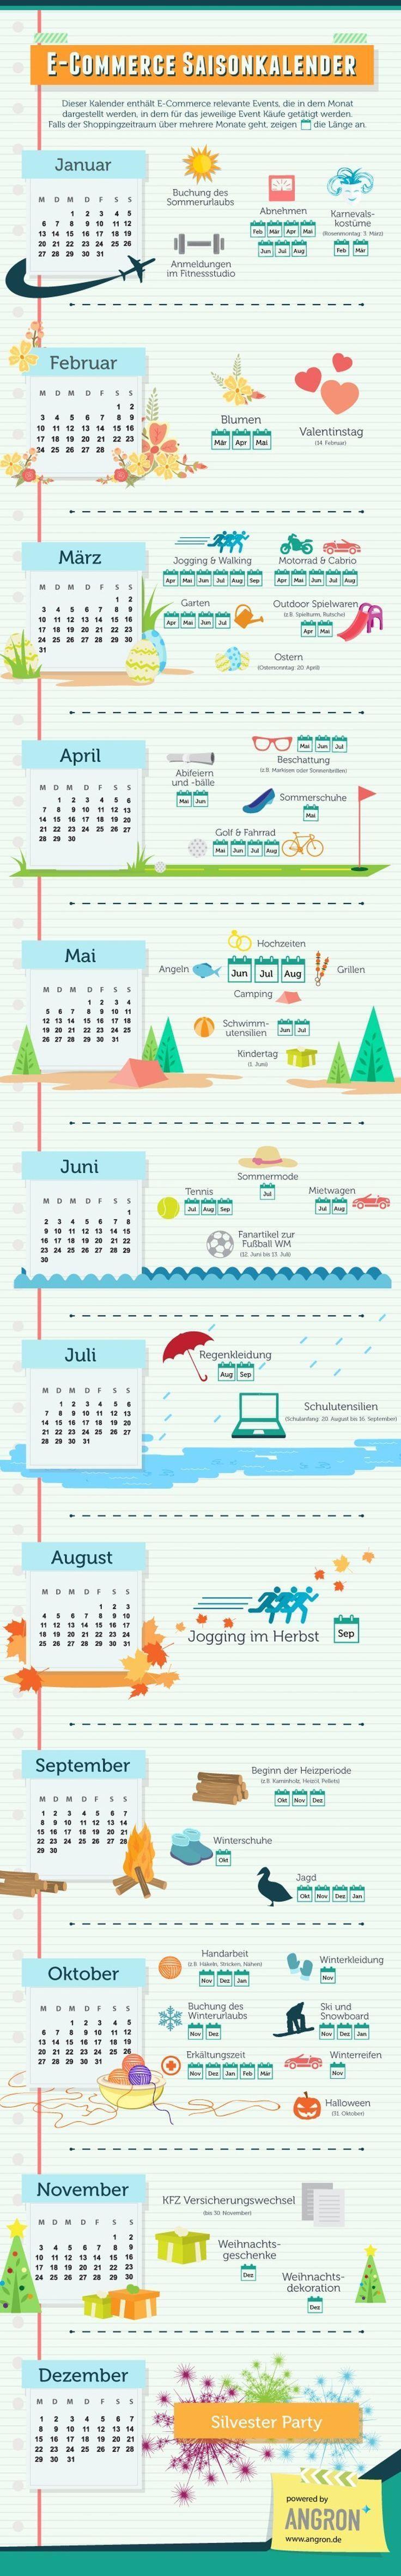 e-commerce_saisonkalender #Ecommerce